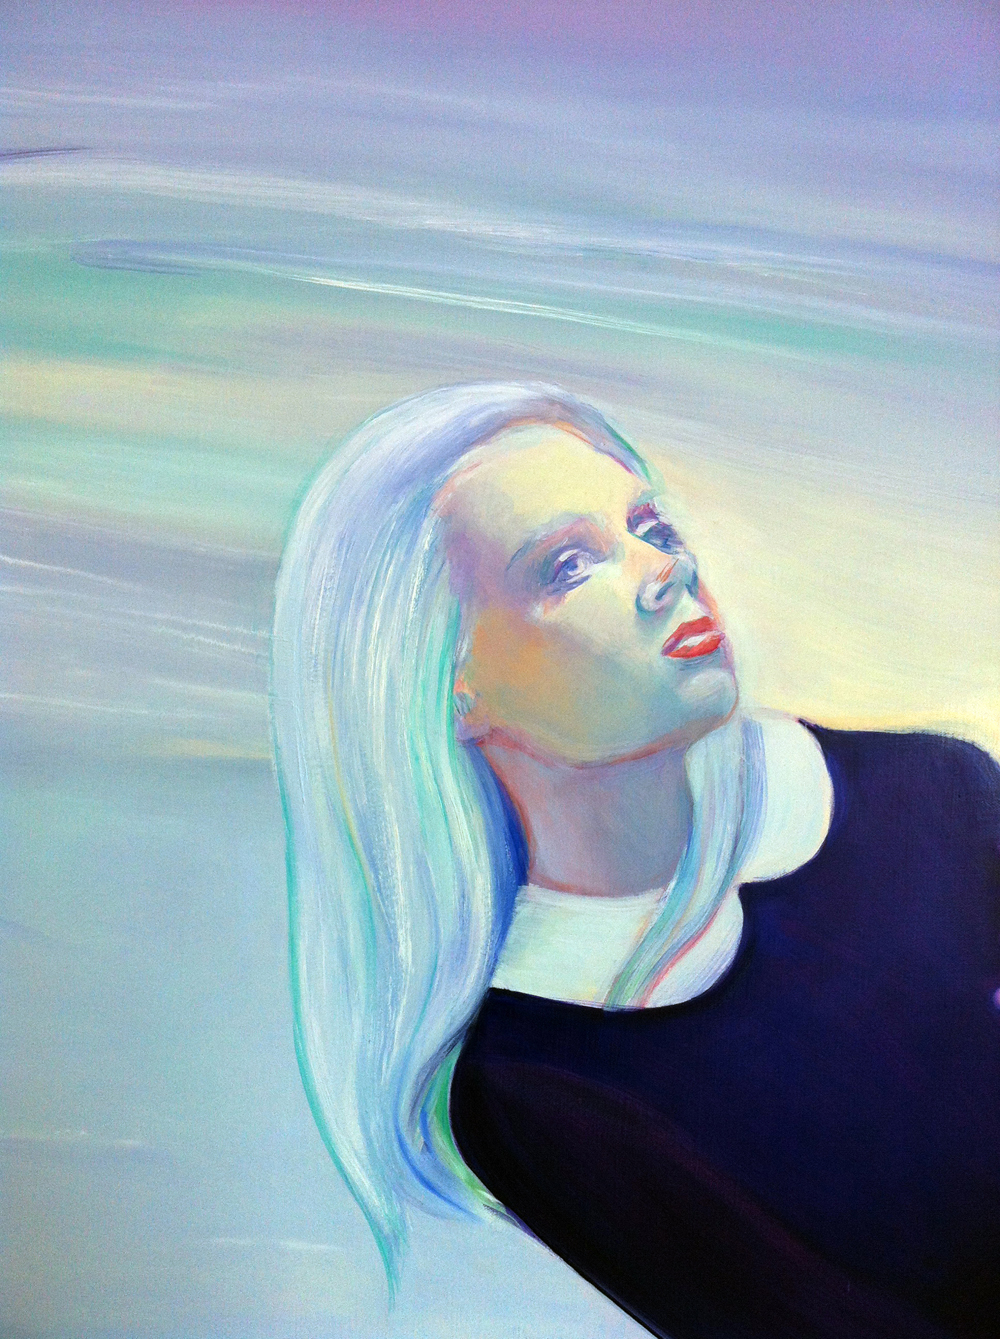 "Lucrece, Oil on Linen, 56"" by 78"", 2014. Detail."